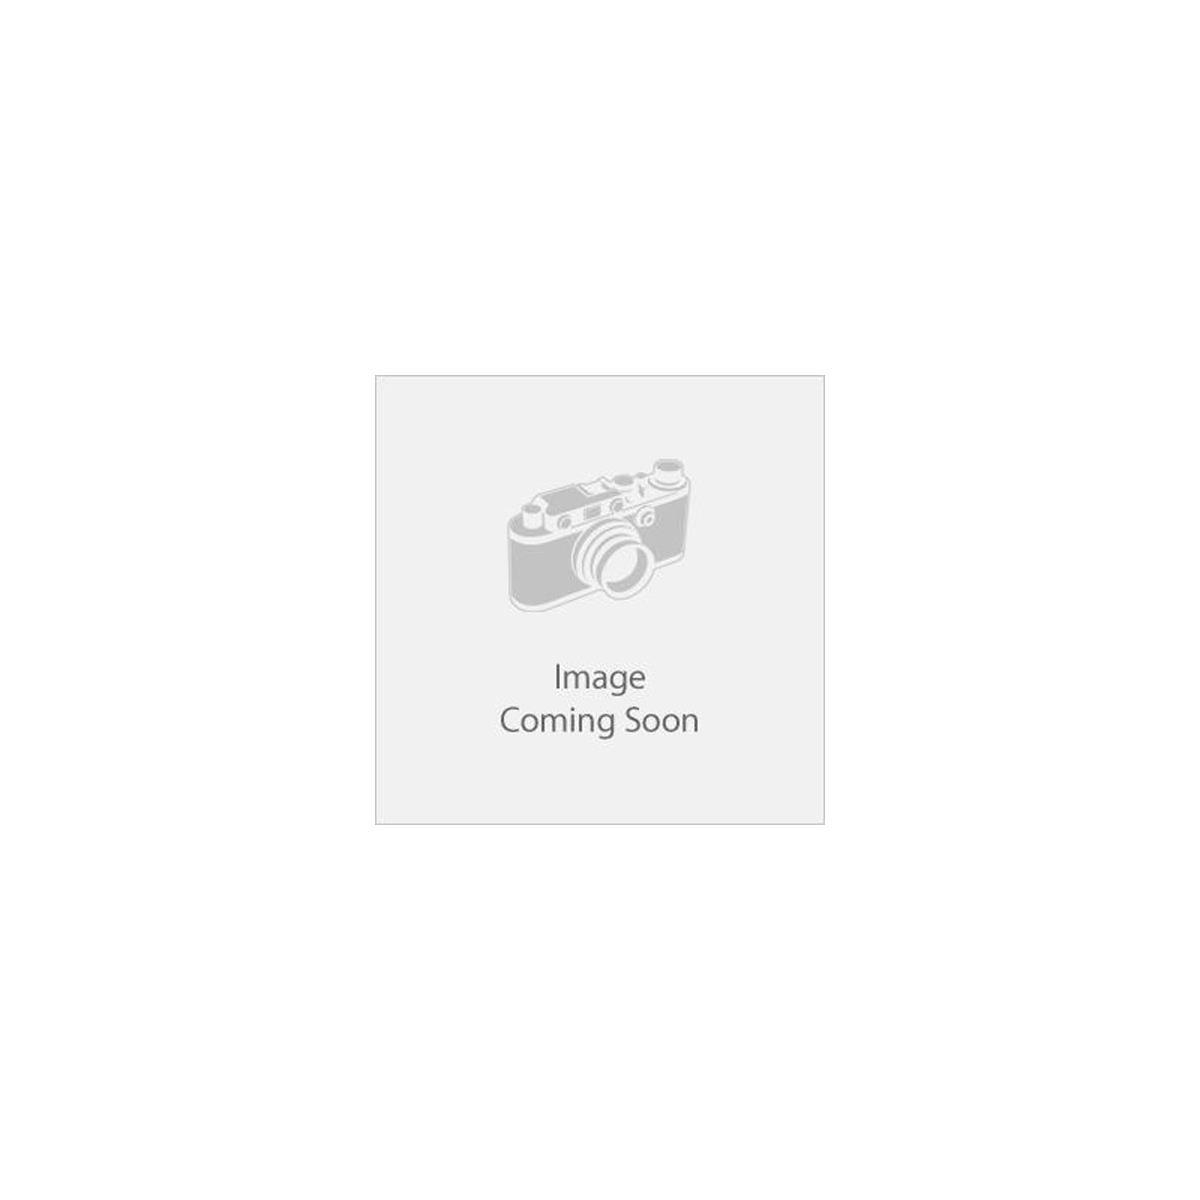 Able-Planet-Photoshop-and-Premiere-Elements-18-Software-Bundle-DVD-65281603